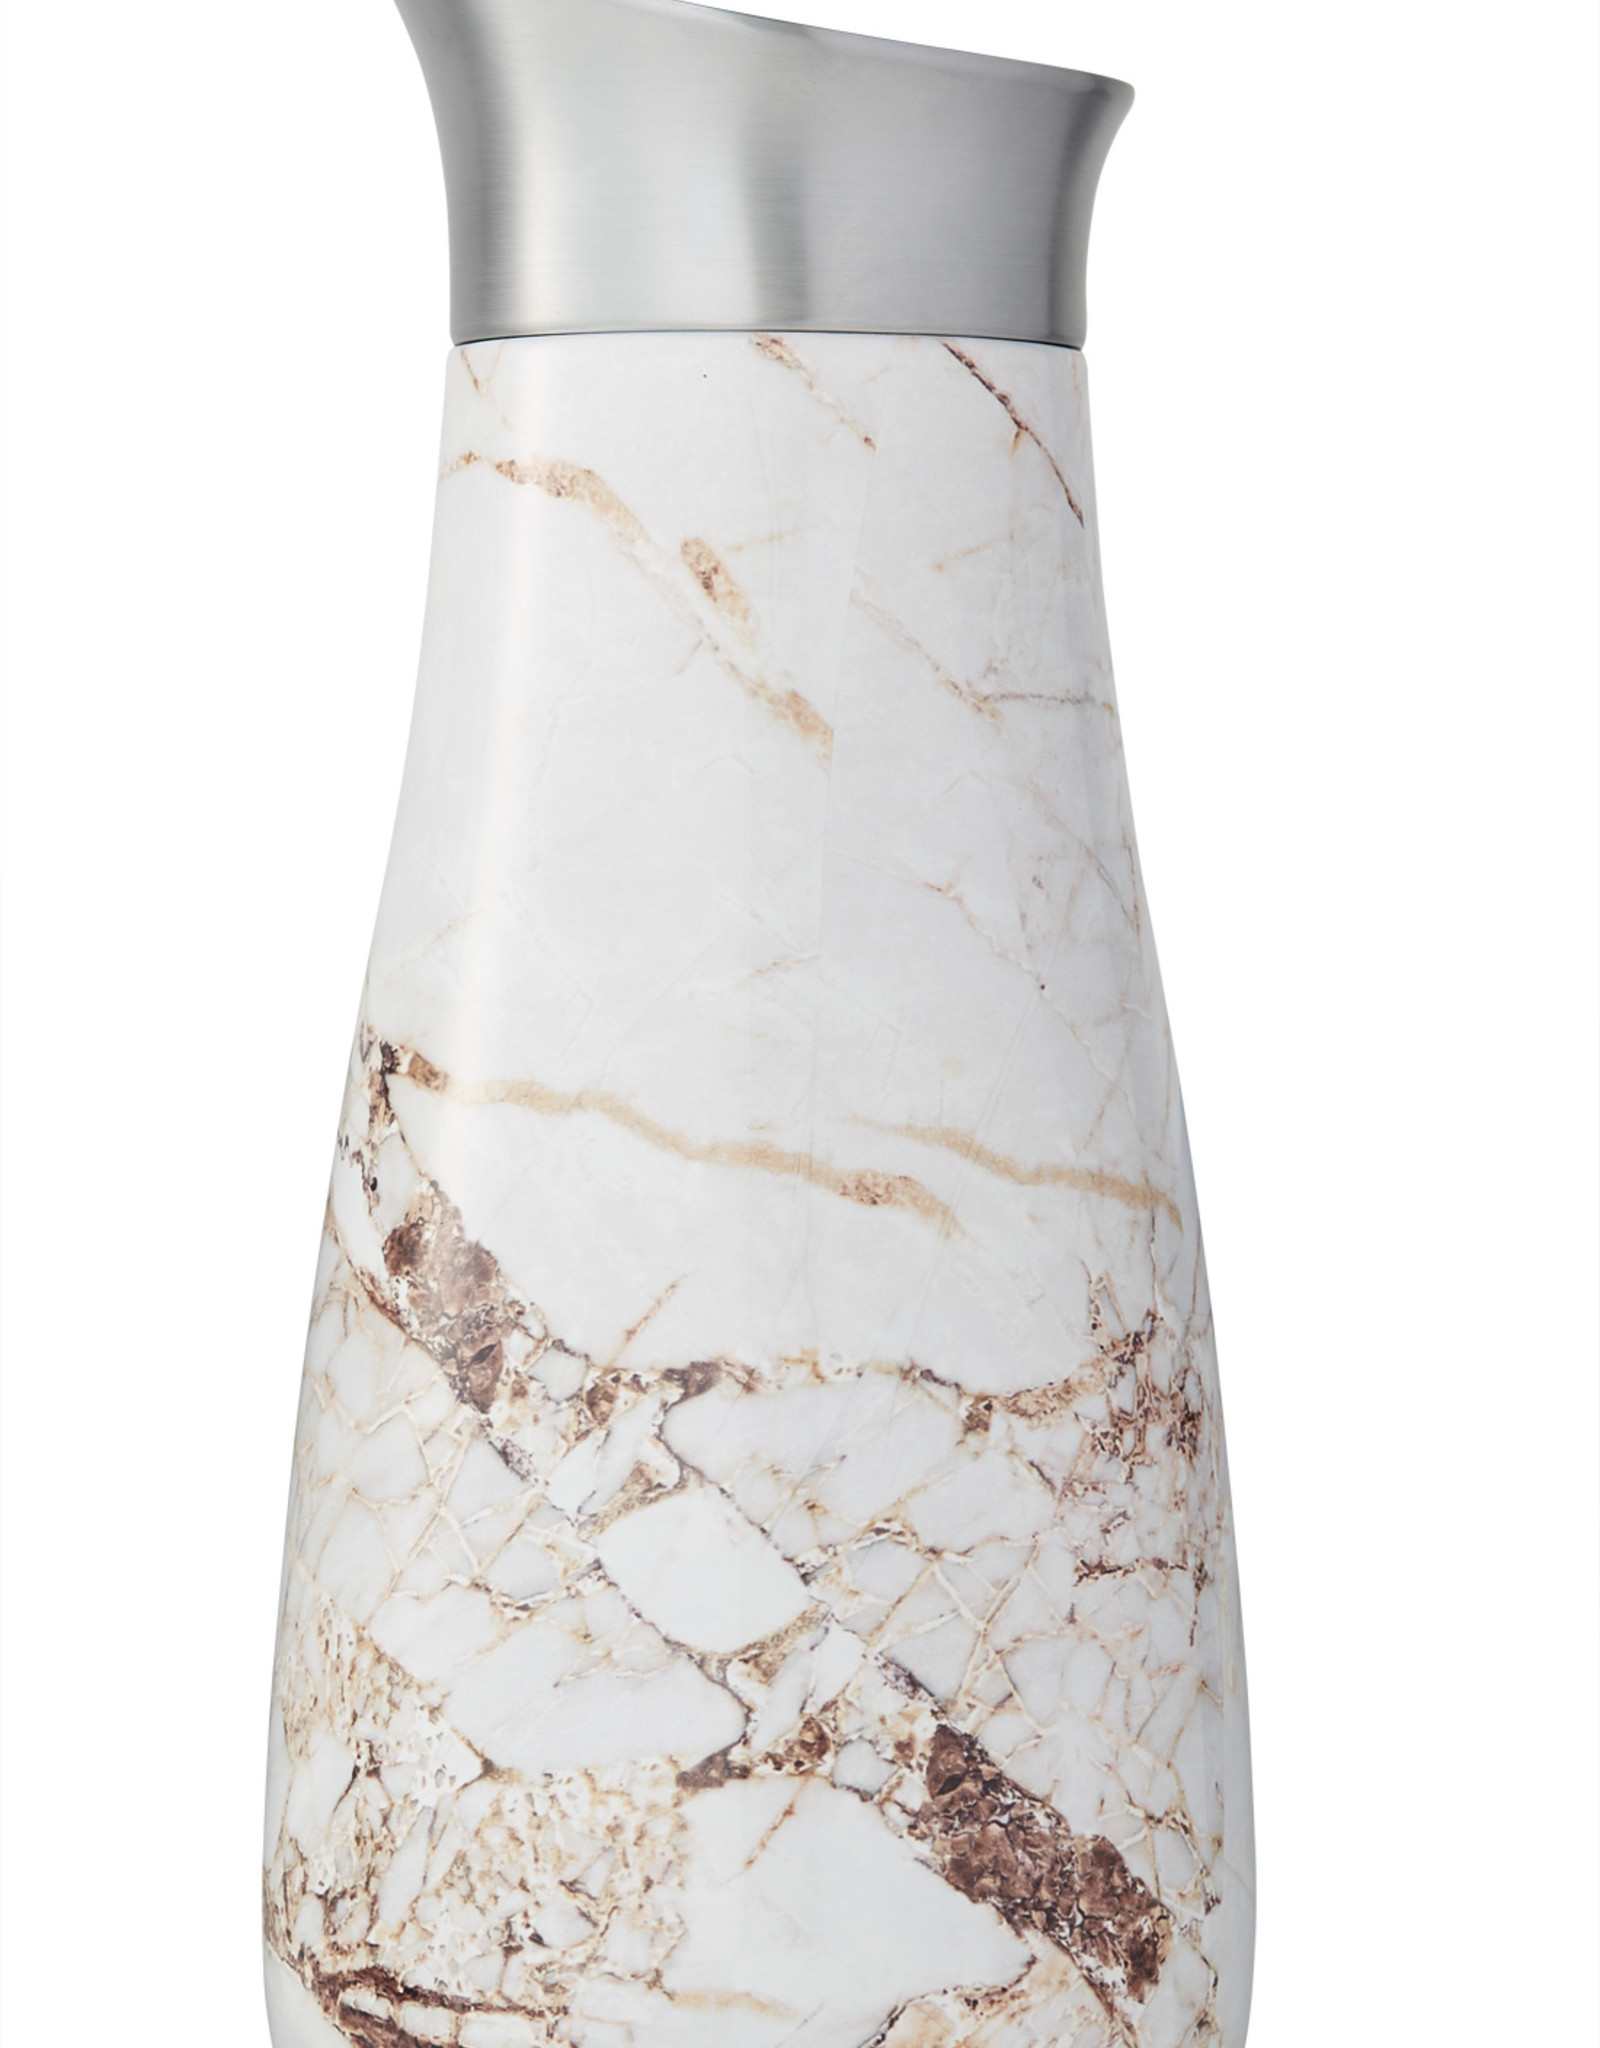 Swell Bottle 51oz Calacatta Gold Carafe